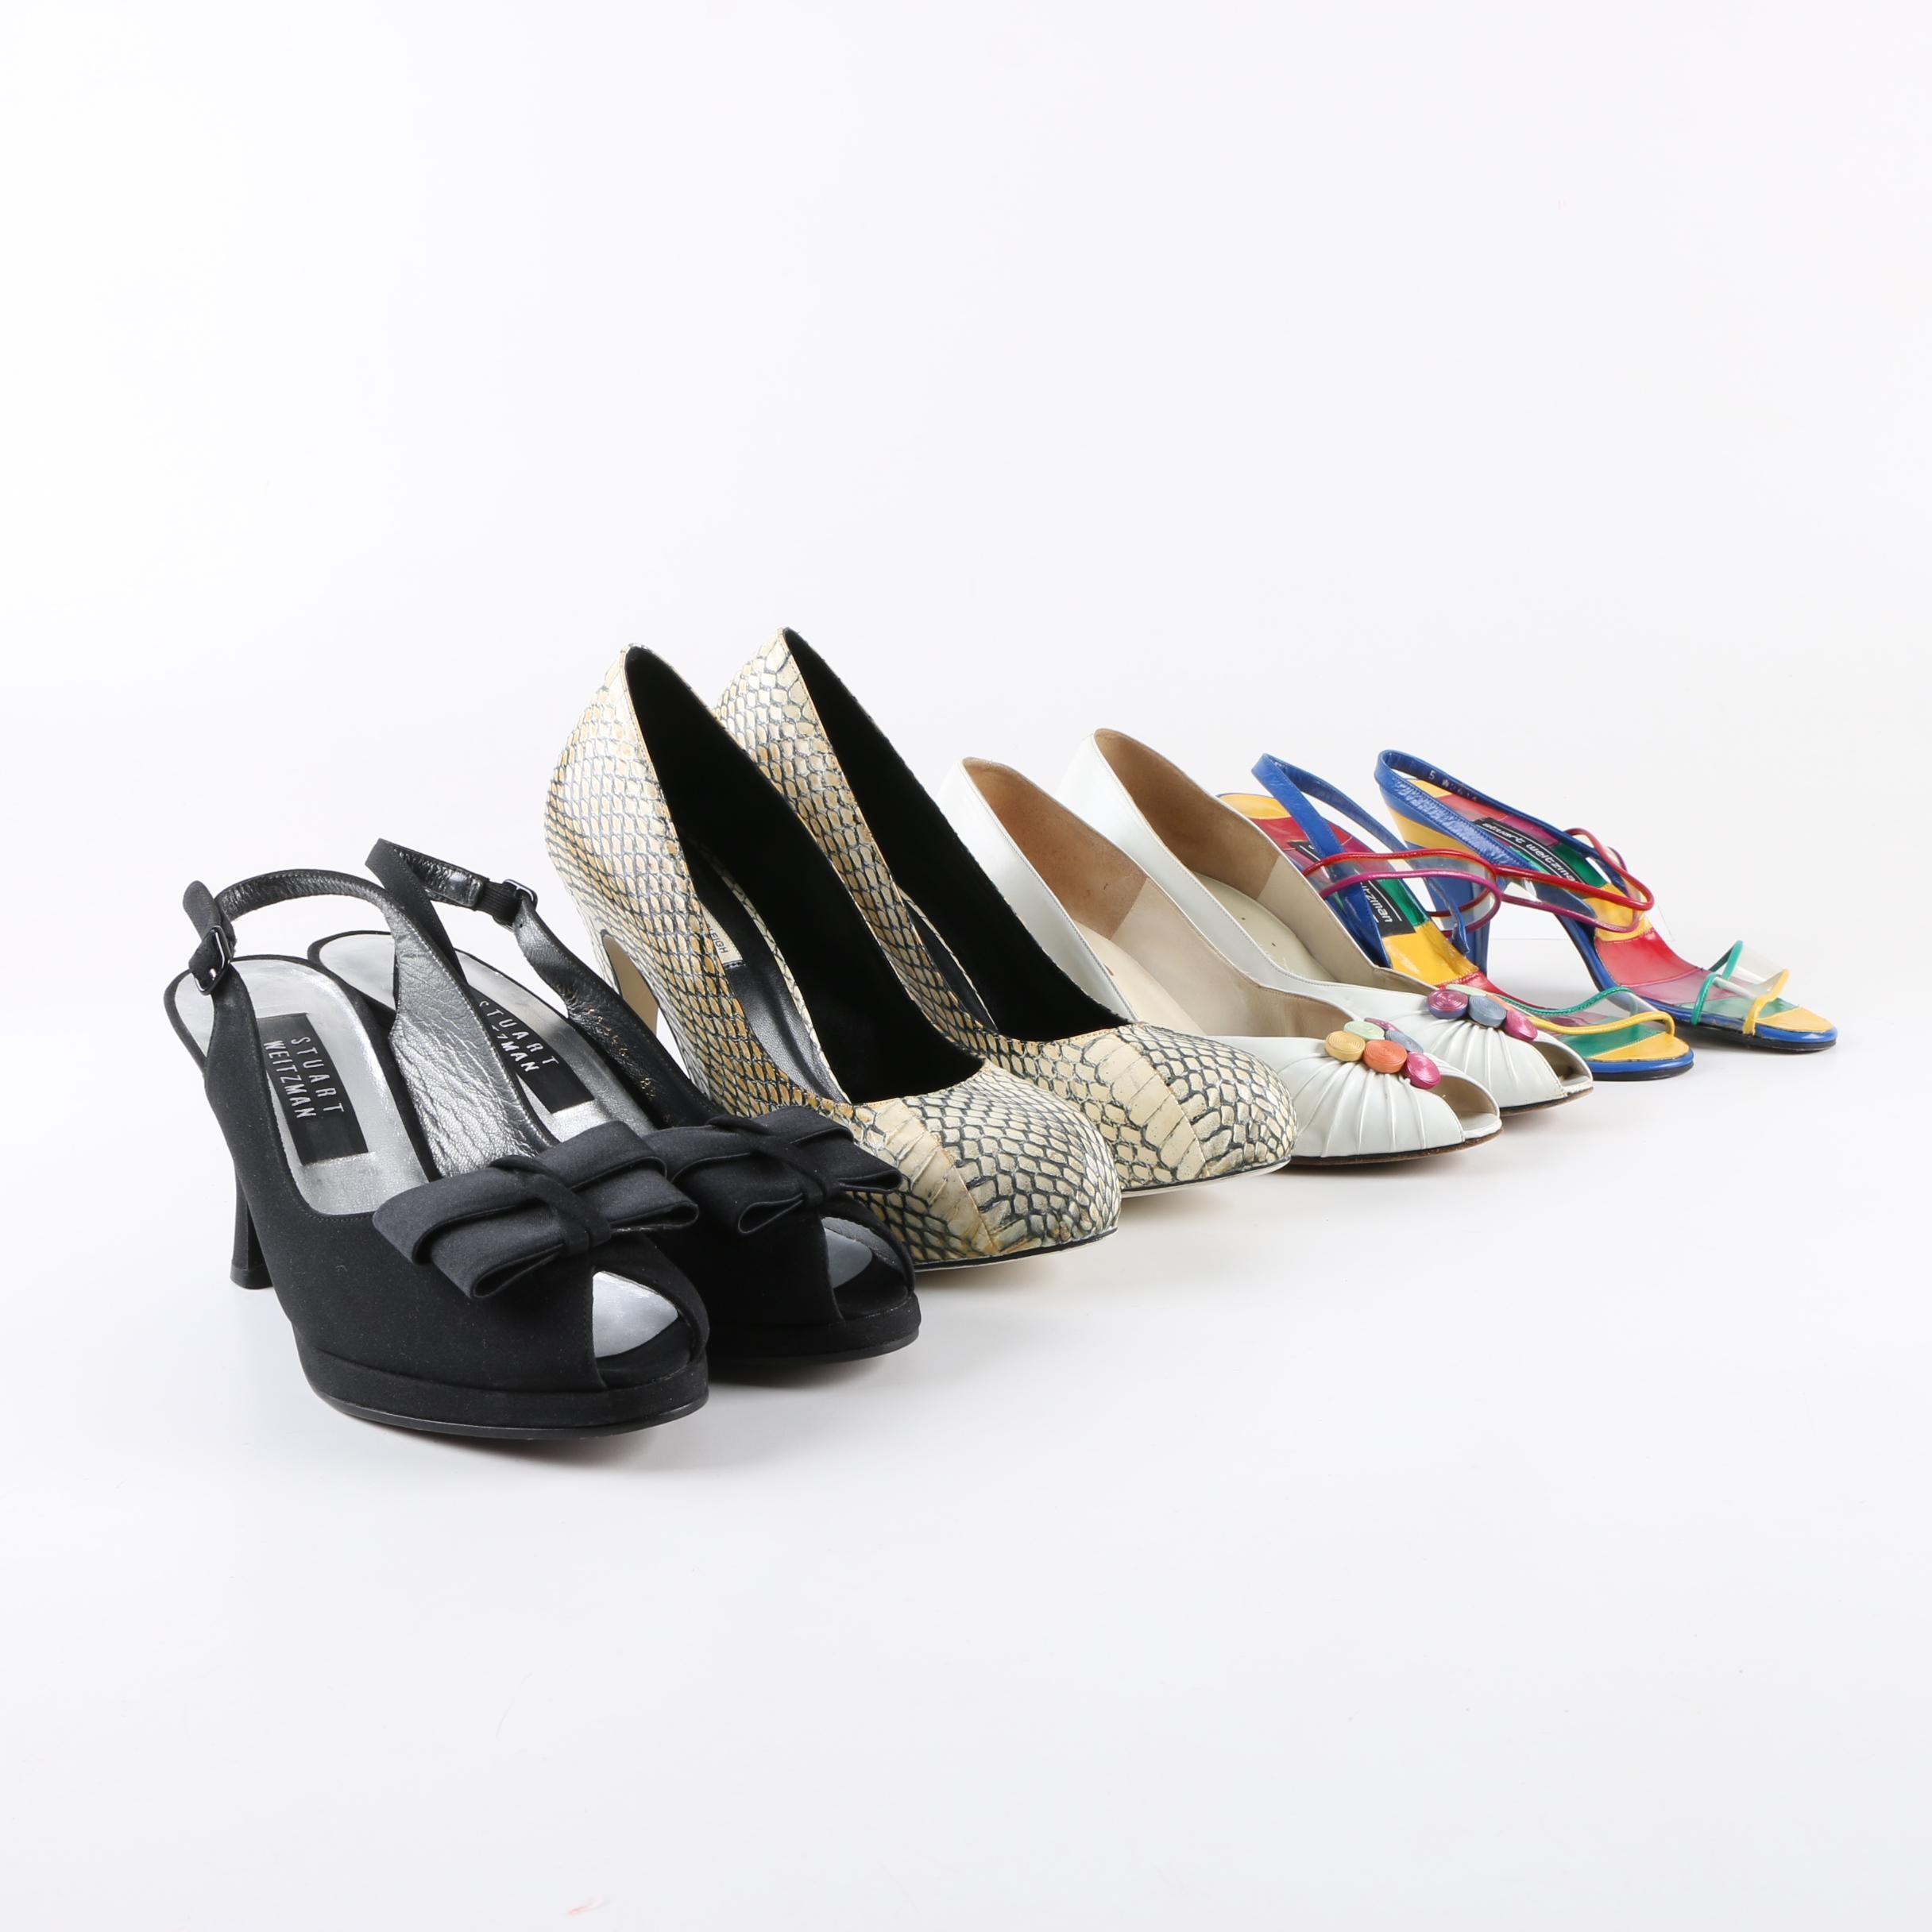 Vintage Heels Including Stuart Weitzman, Italian, Snakeskin